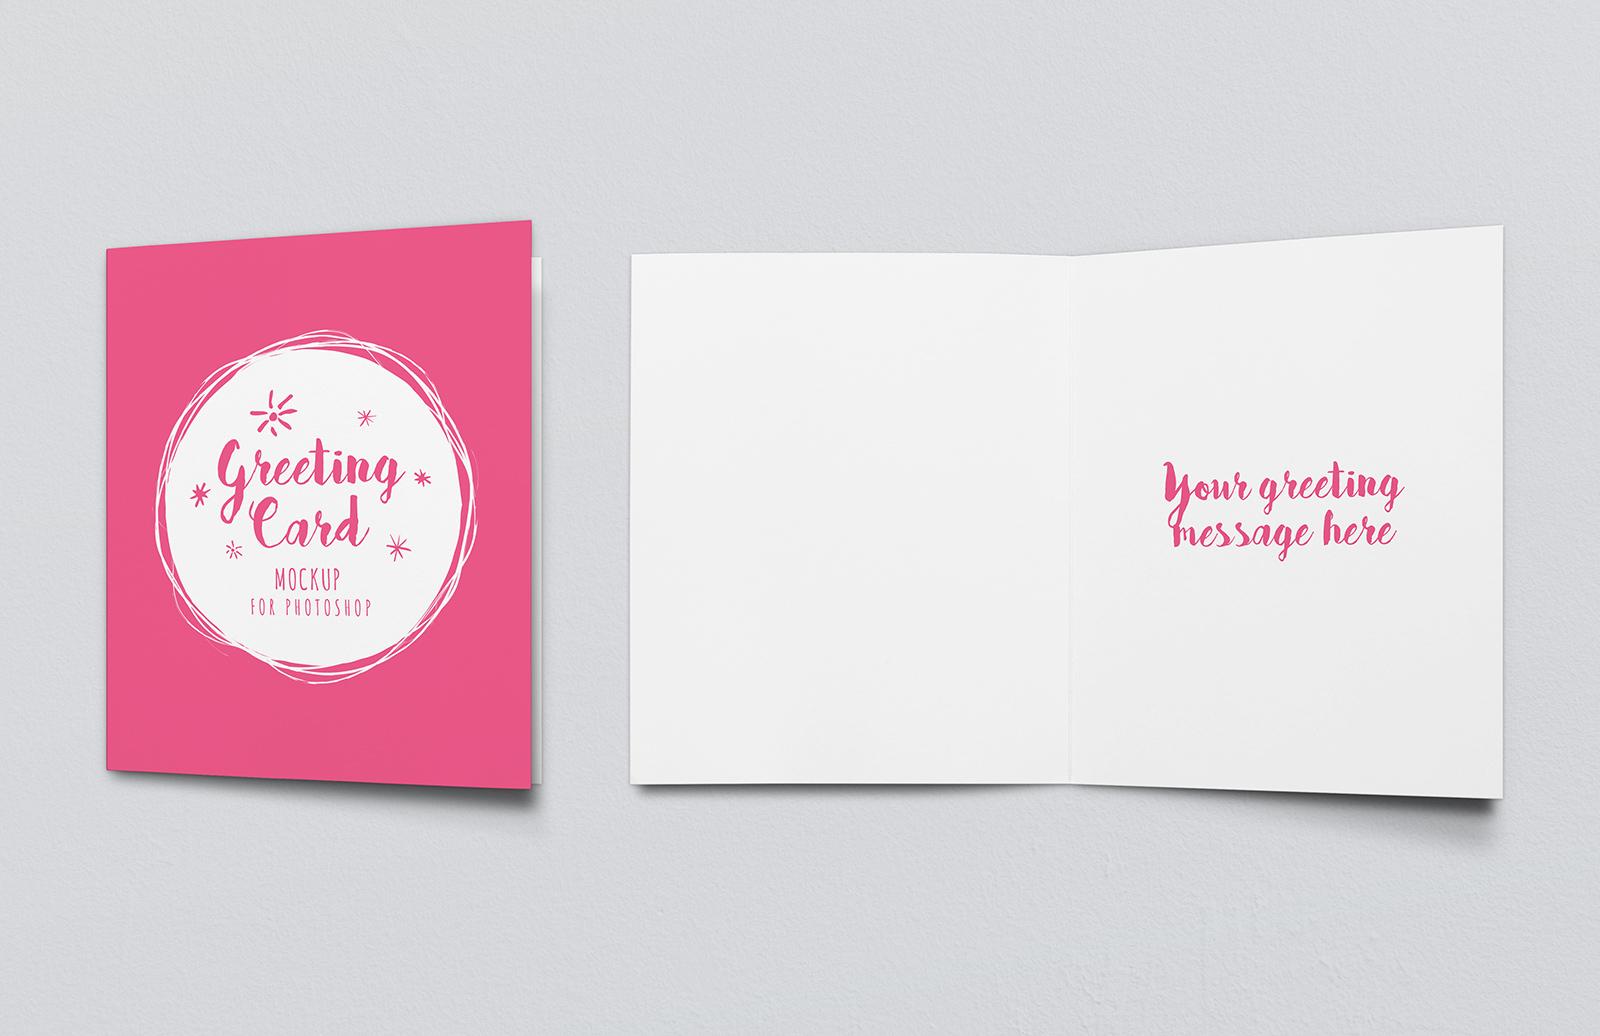 Greeting Card Mockup - Vol 2